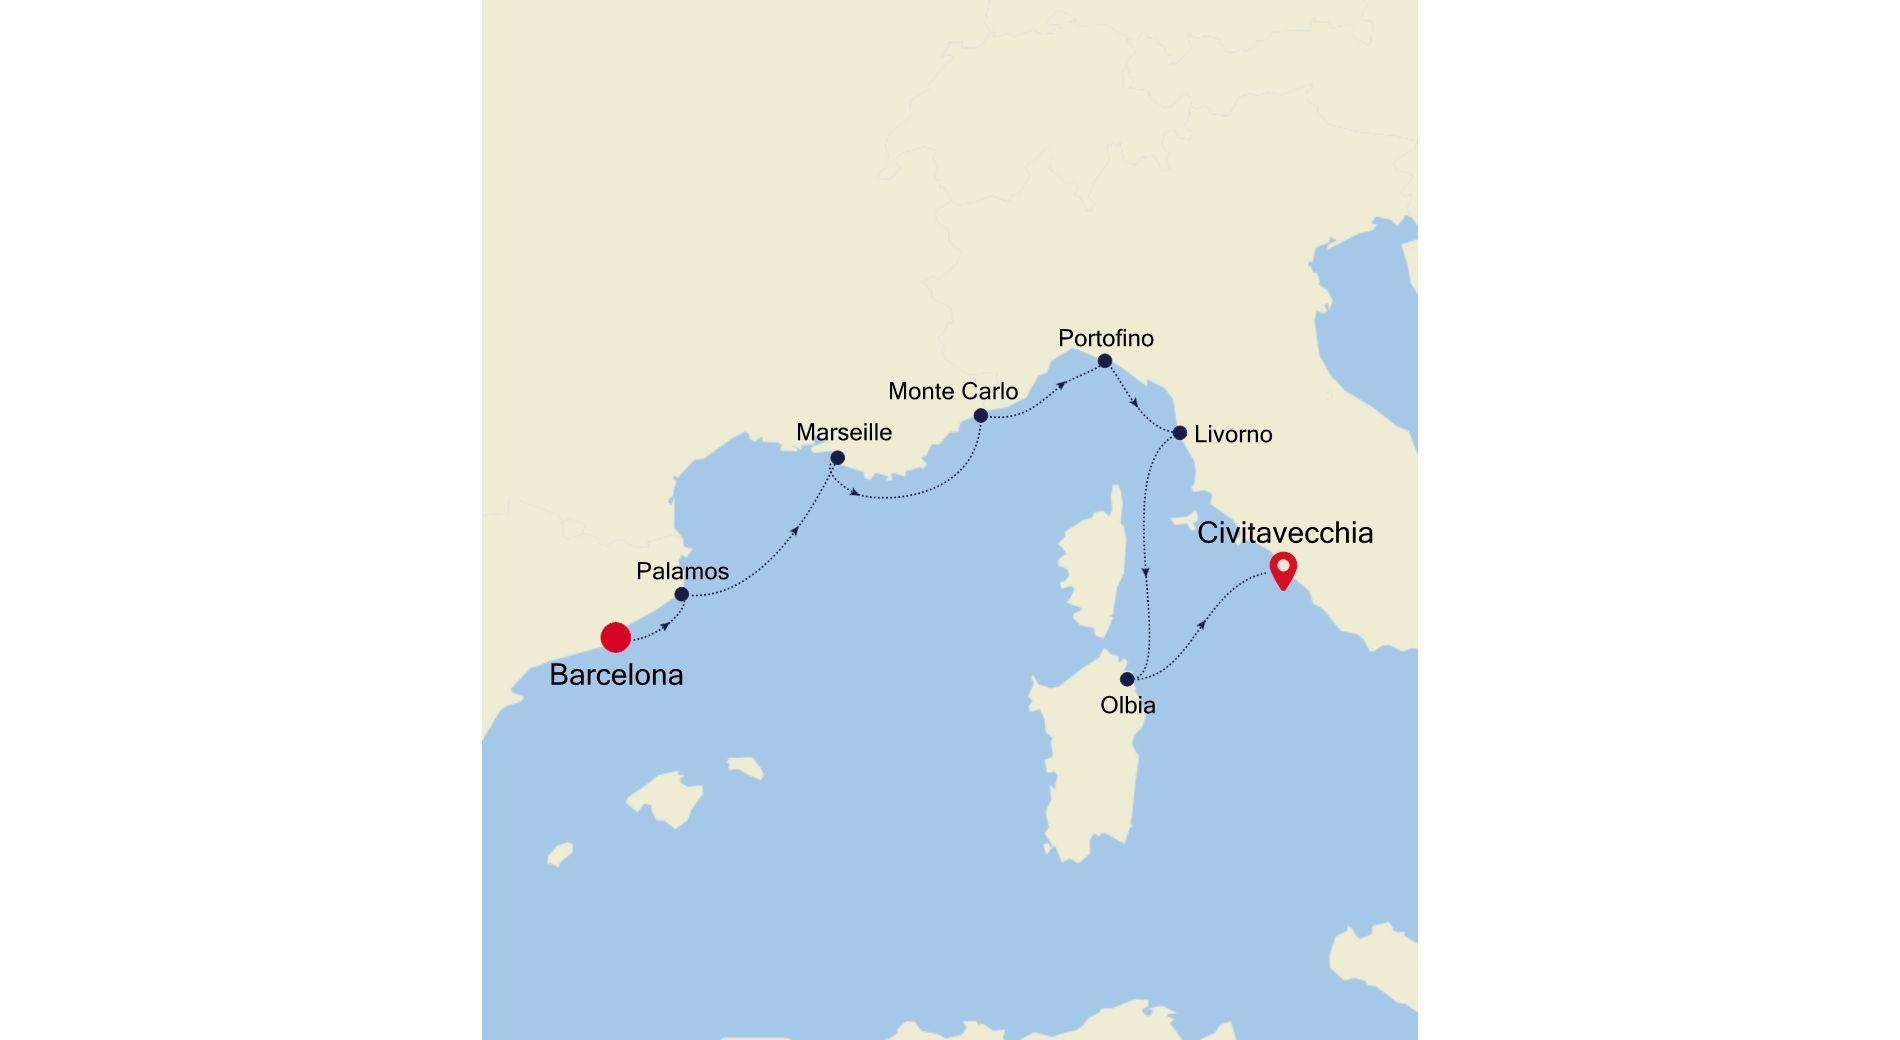 MO210614007 - Barcelona nach Civitavecchia